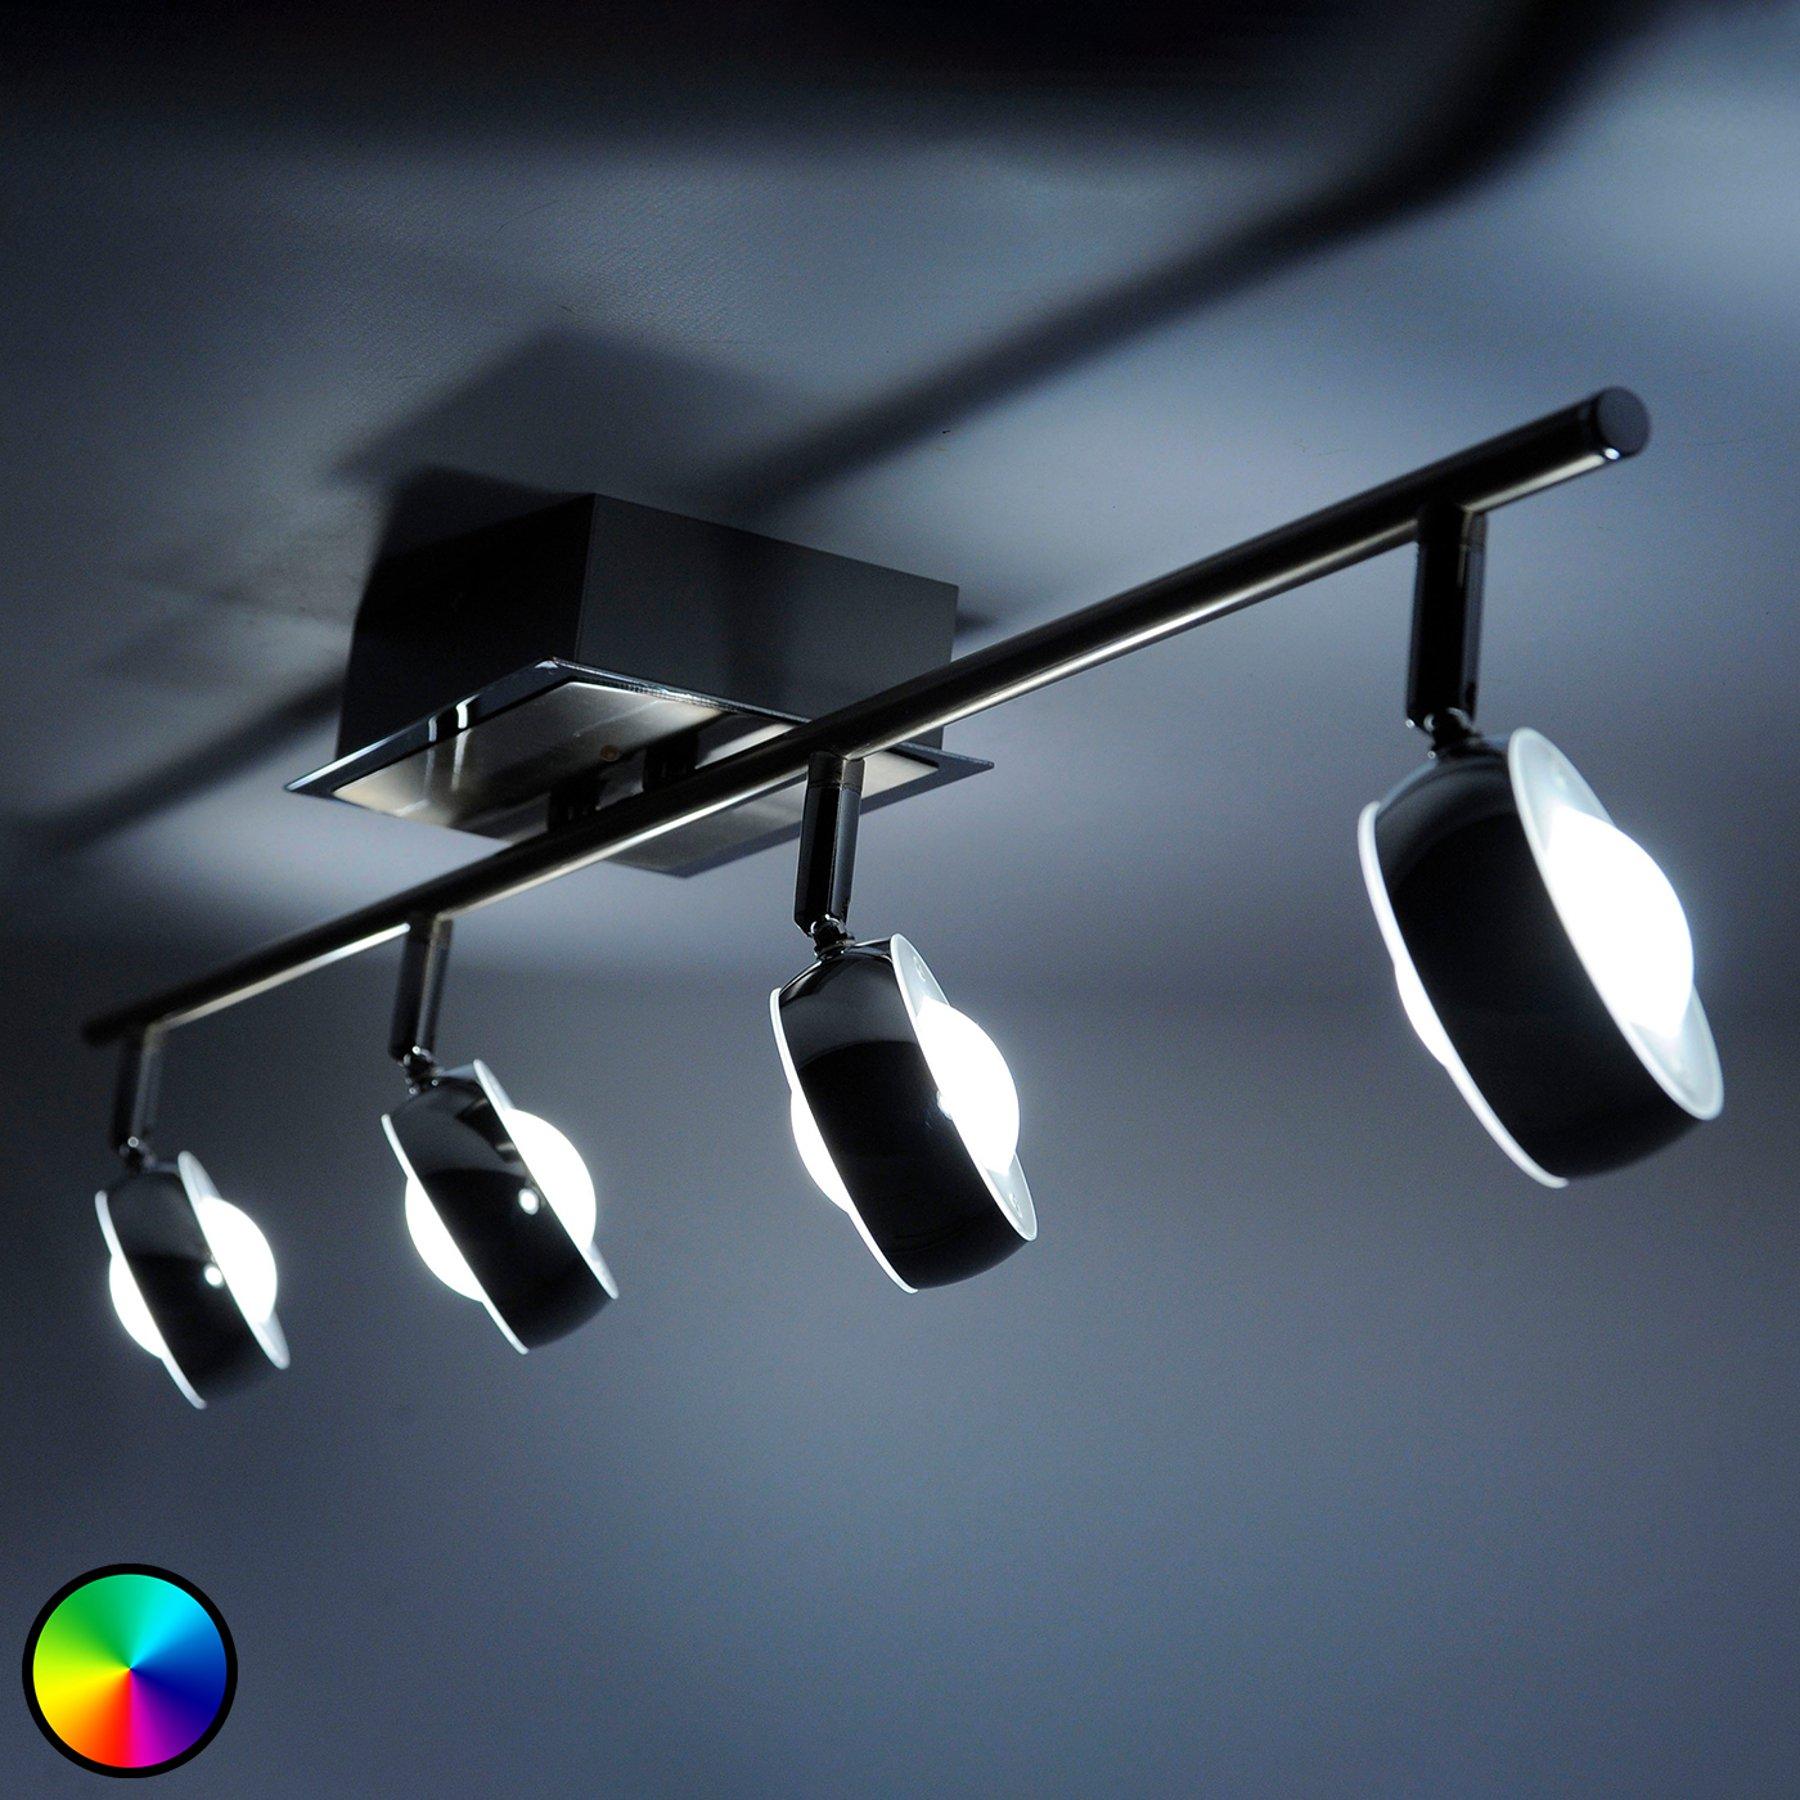 LED-taklampe Majvi med justerbart lys